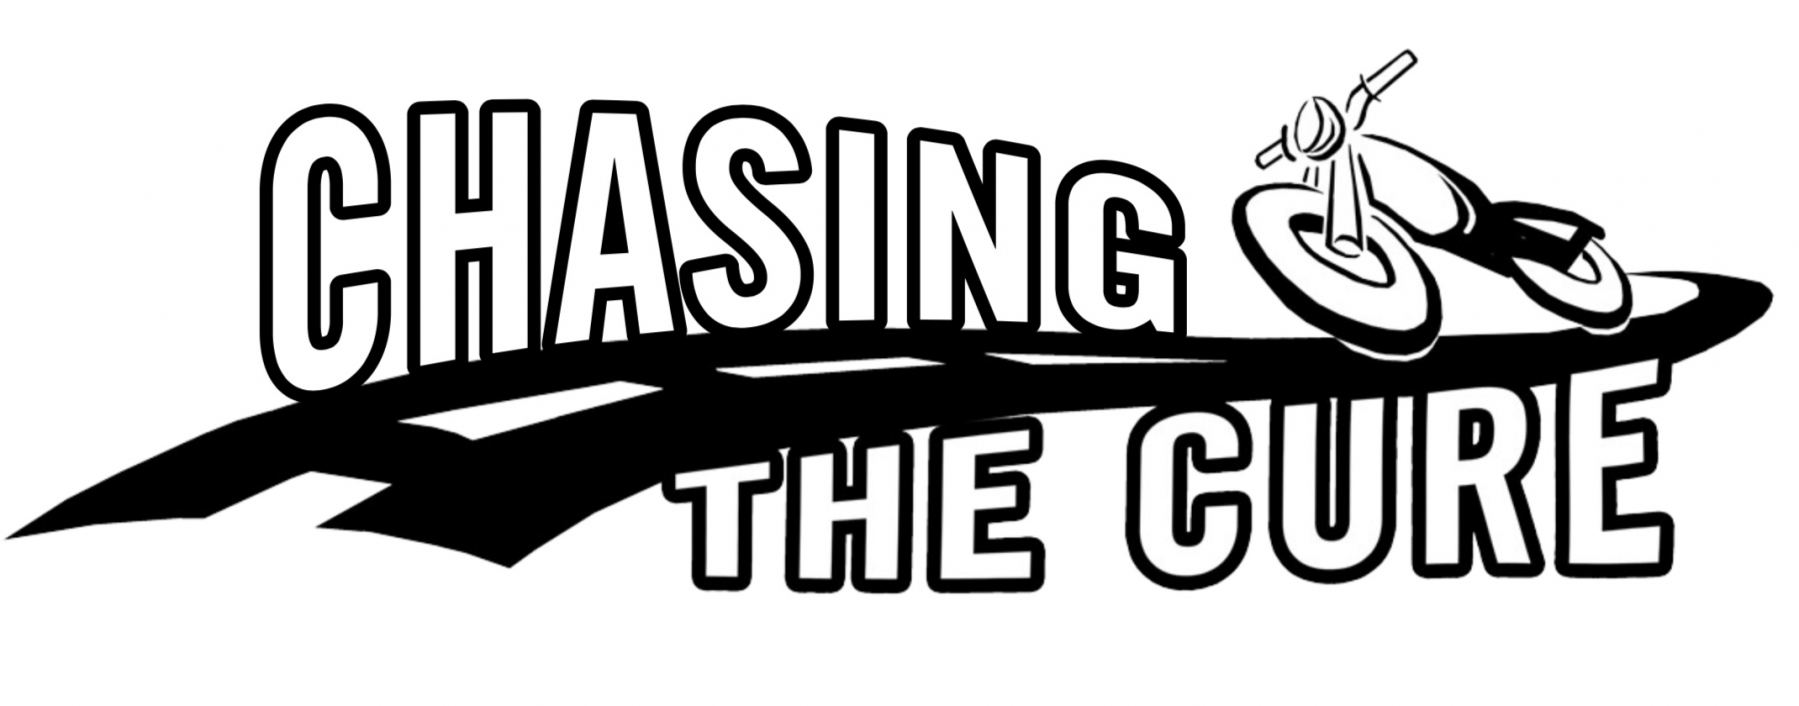 Longhaulpaul's Chasing the Cure Logo